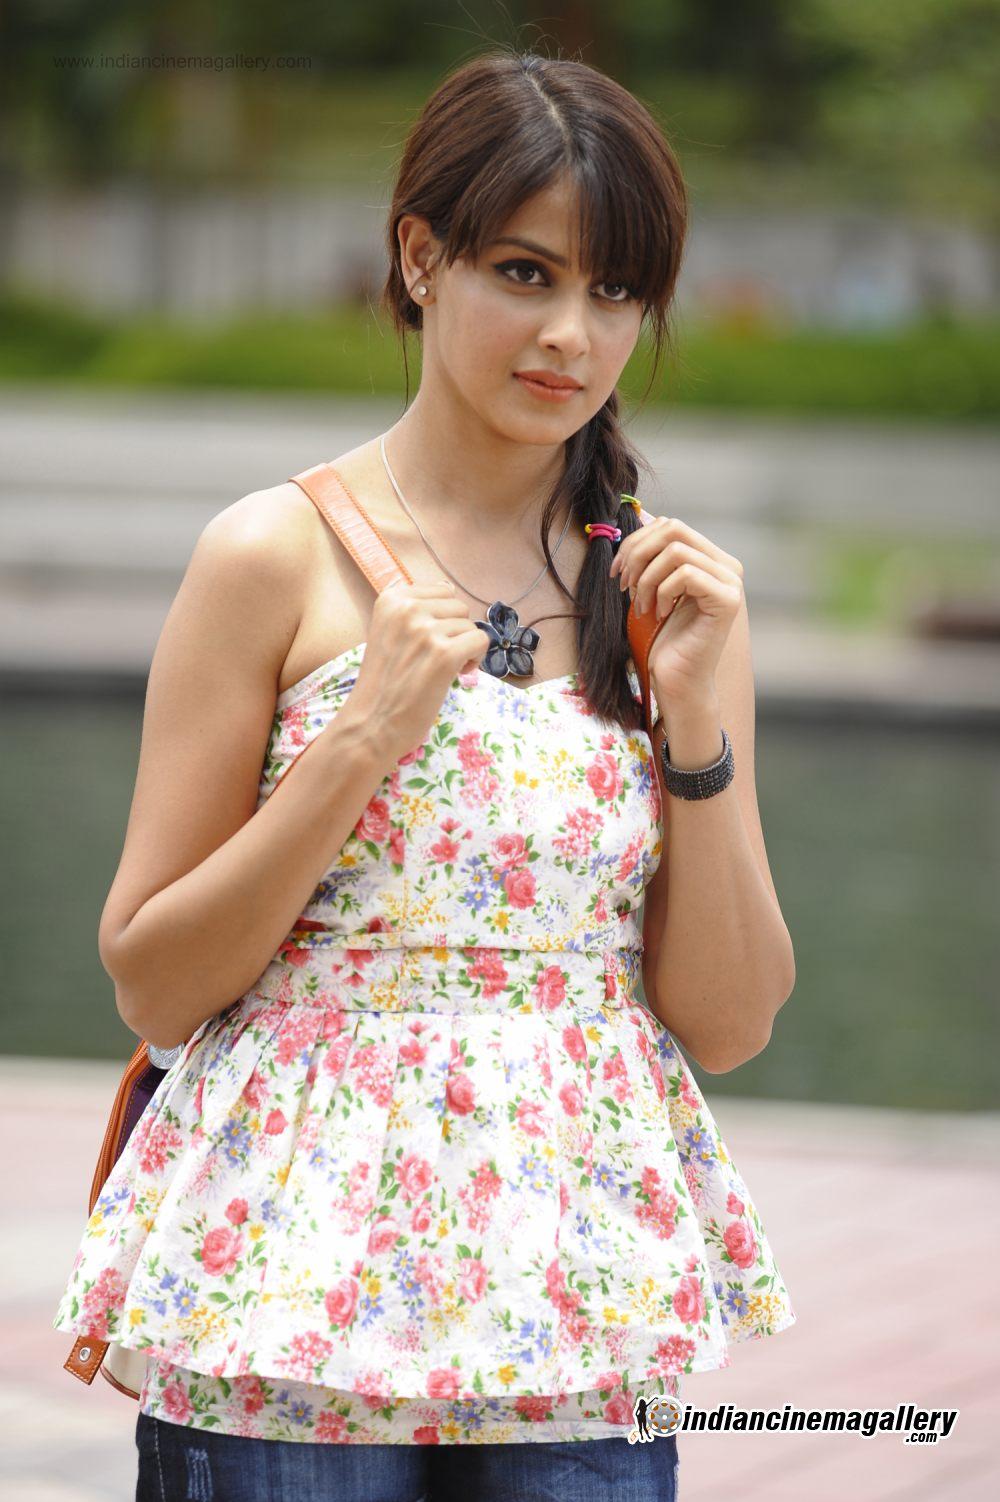 So Beautiful Smile Genelia Deshmukh (Dsouza)